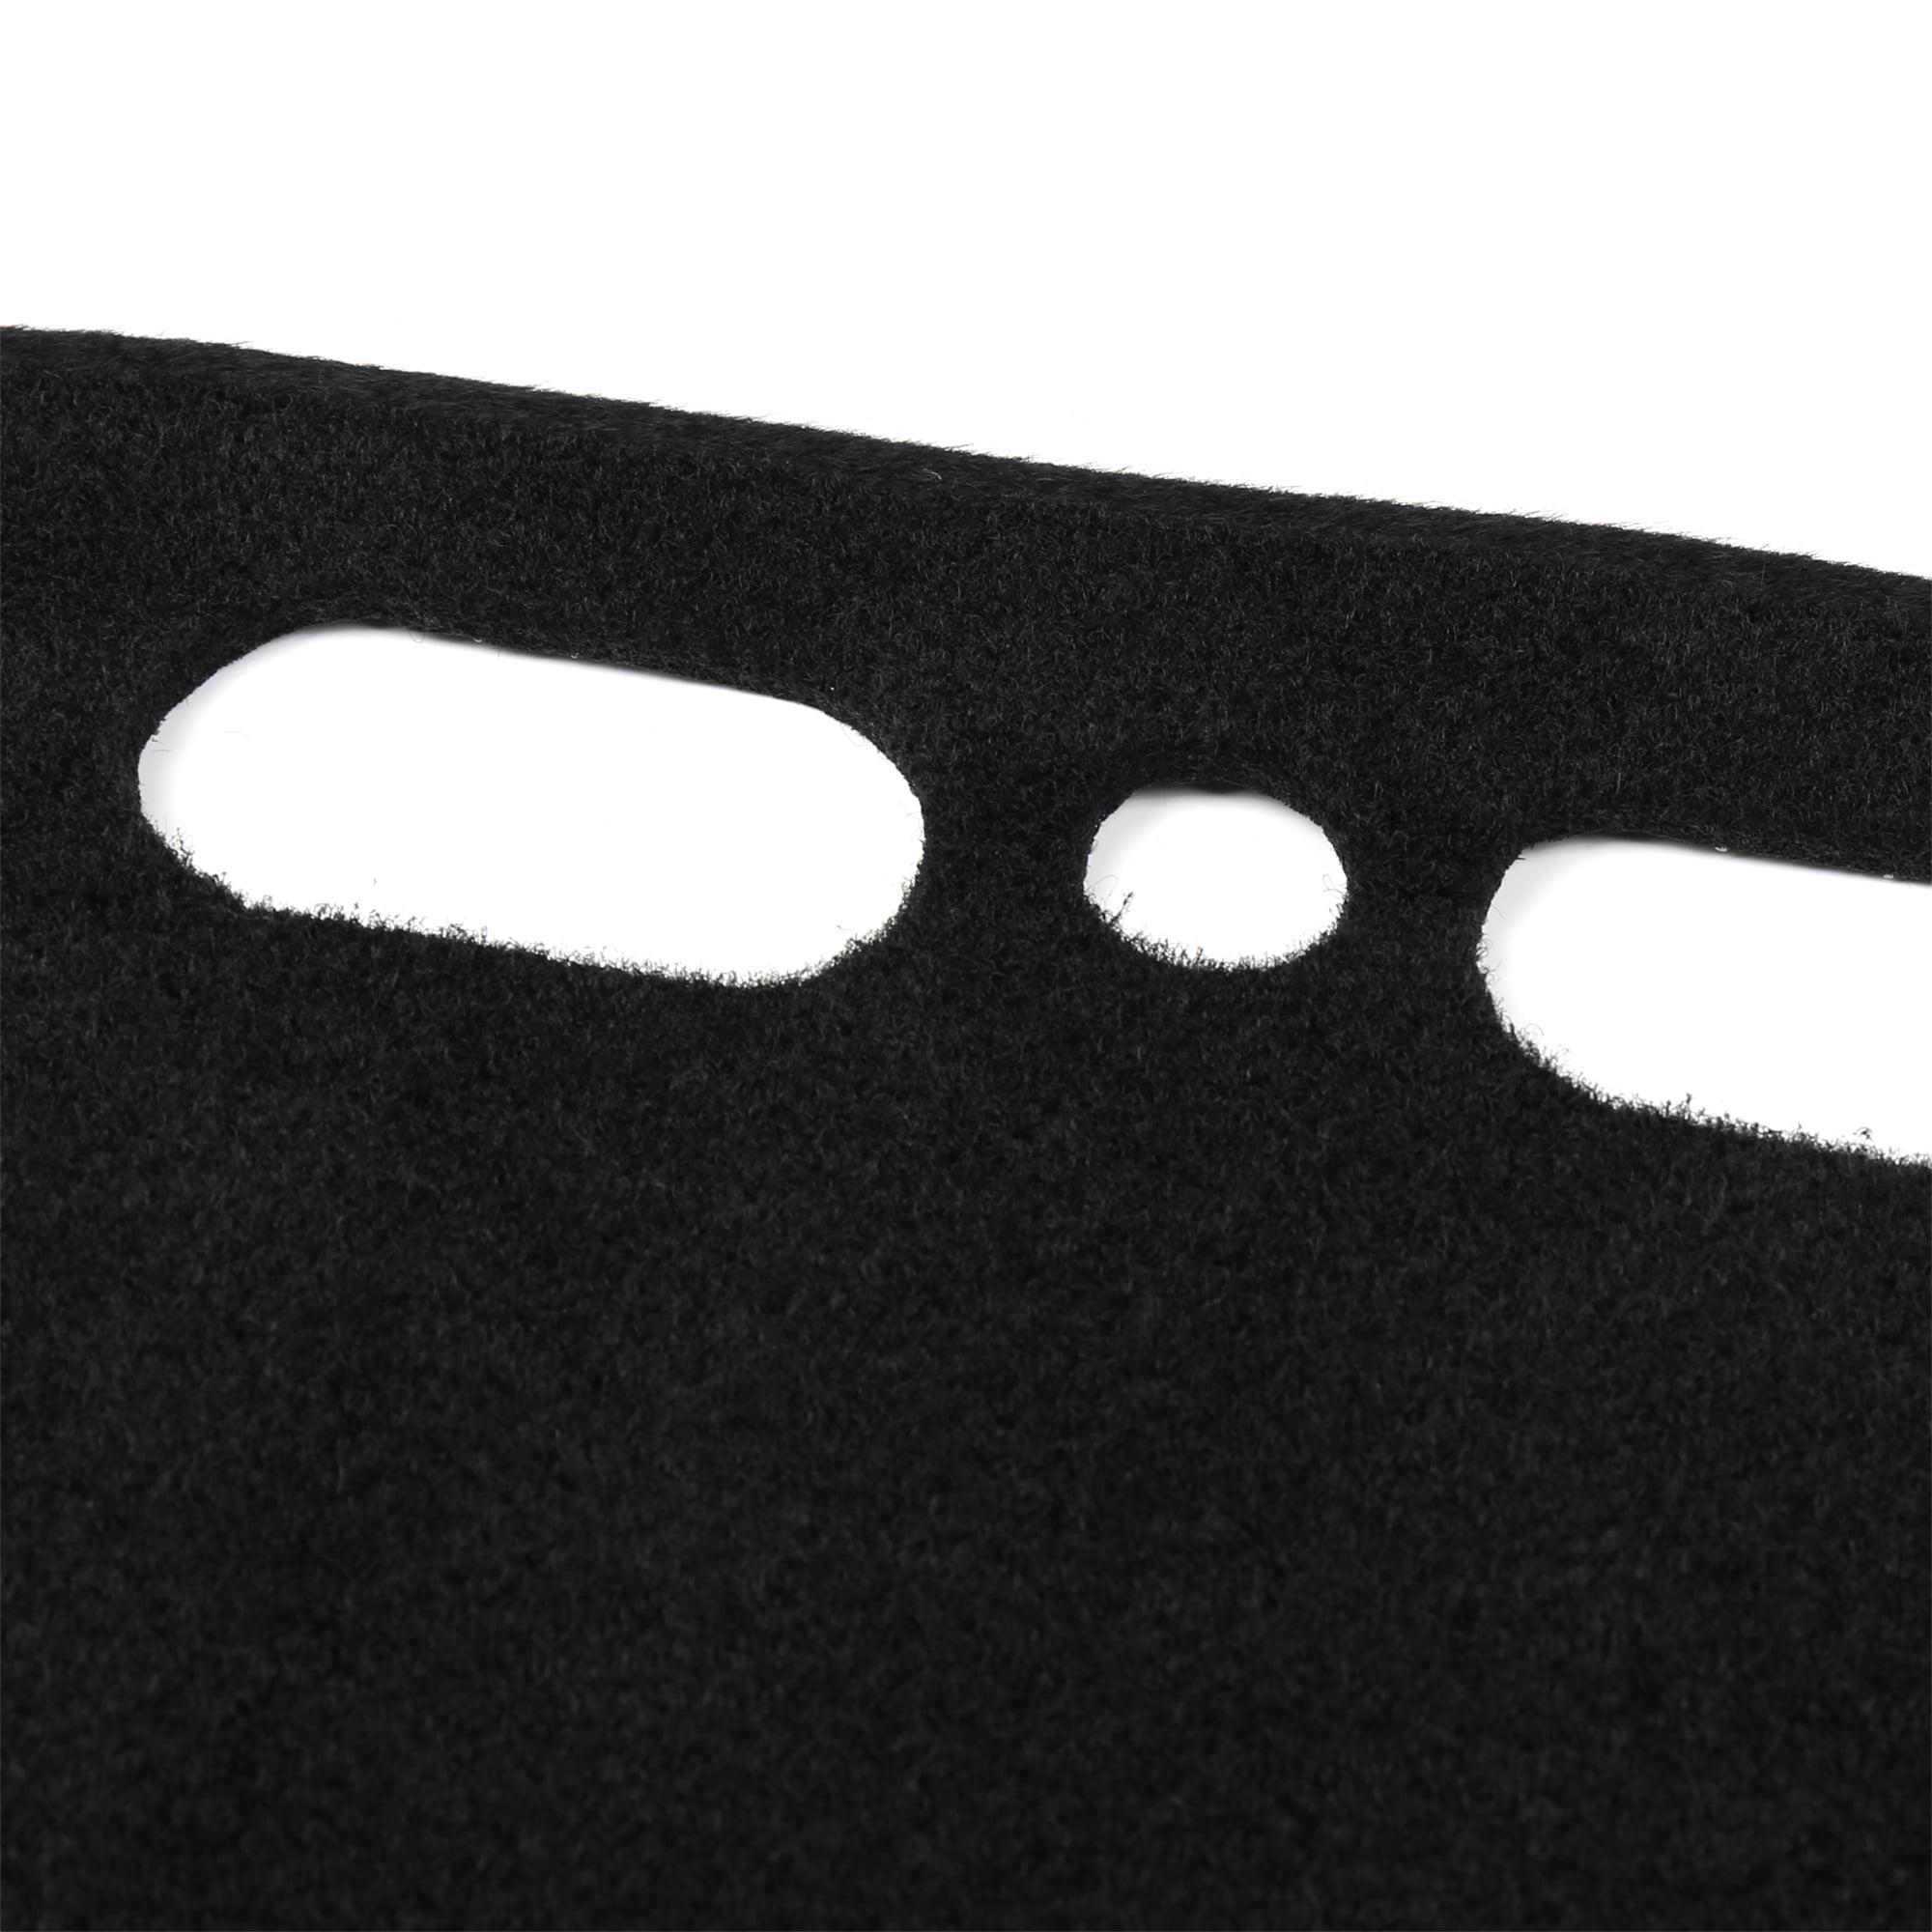 Car Dashboard Cover Nonslip Black Dash Mat Sun Pad for 14-19 Toyota Highlander - image 3 de 4